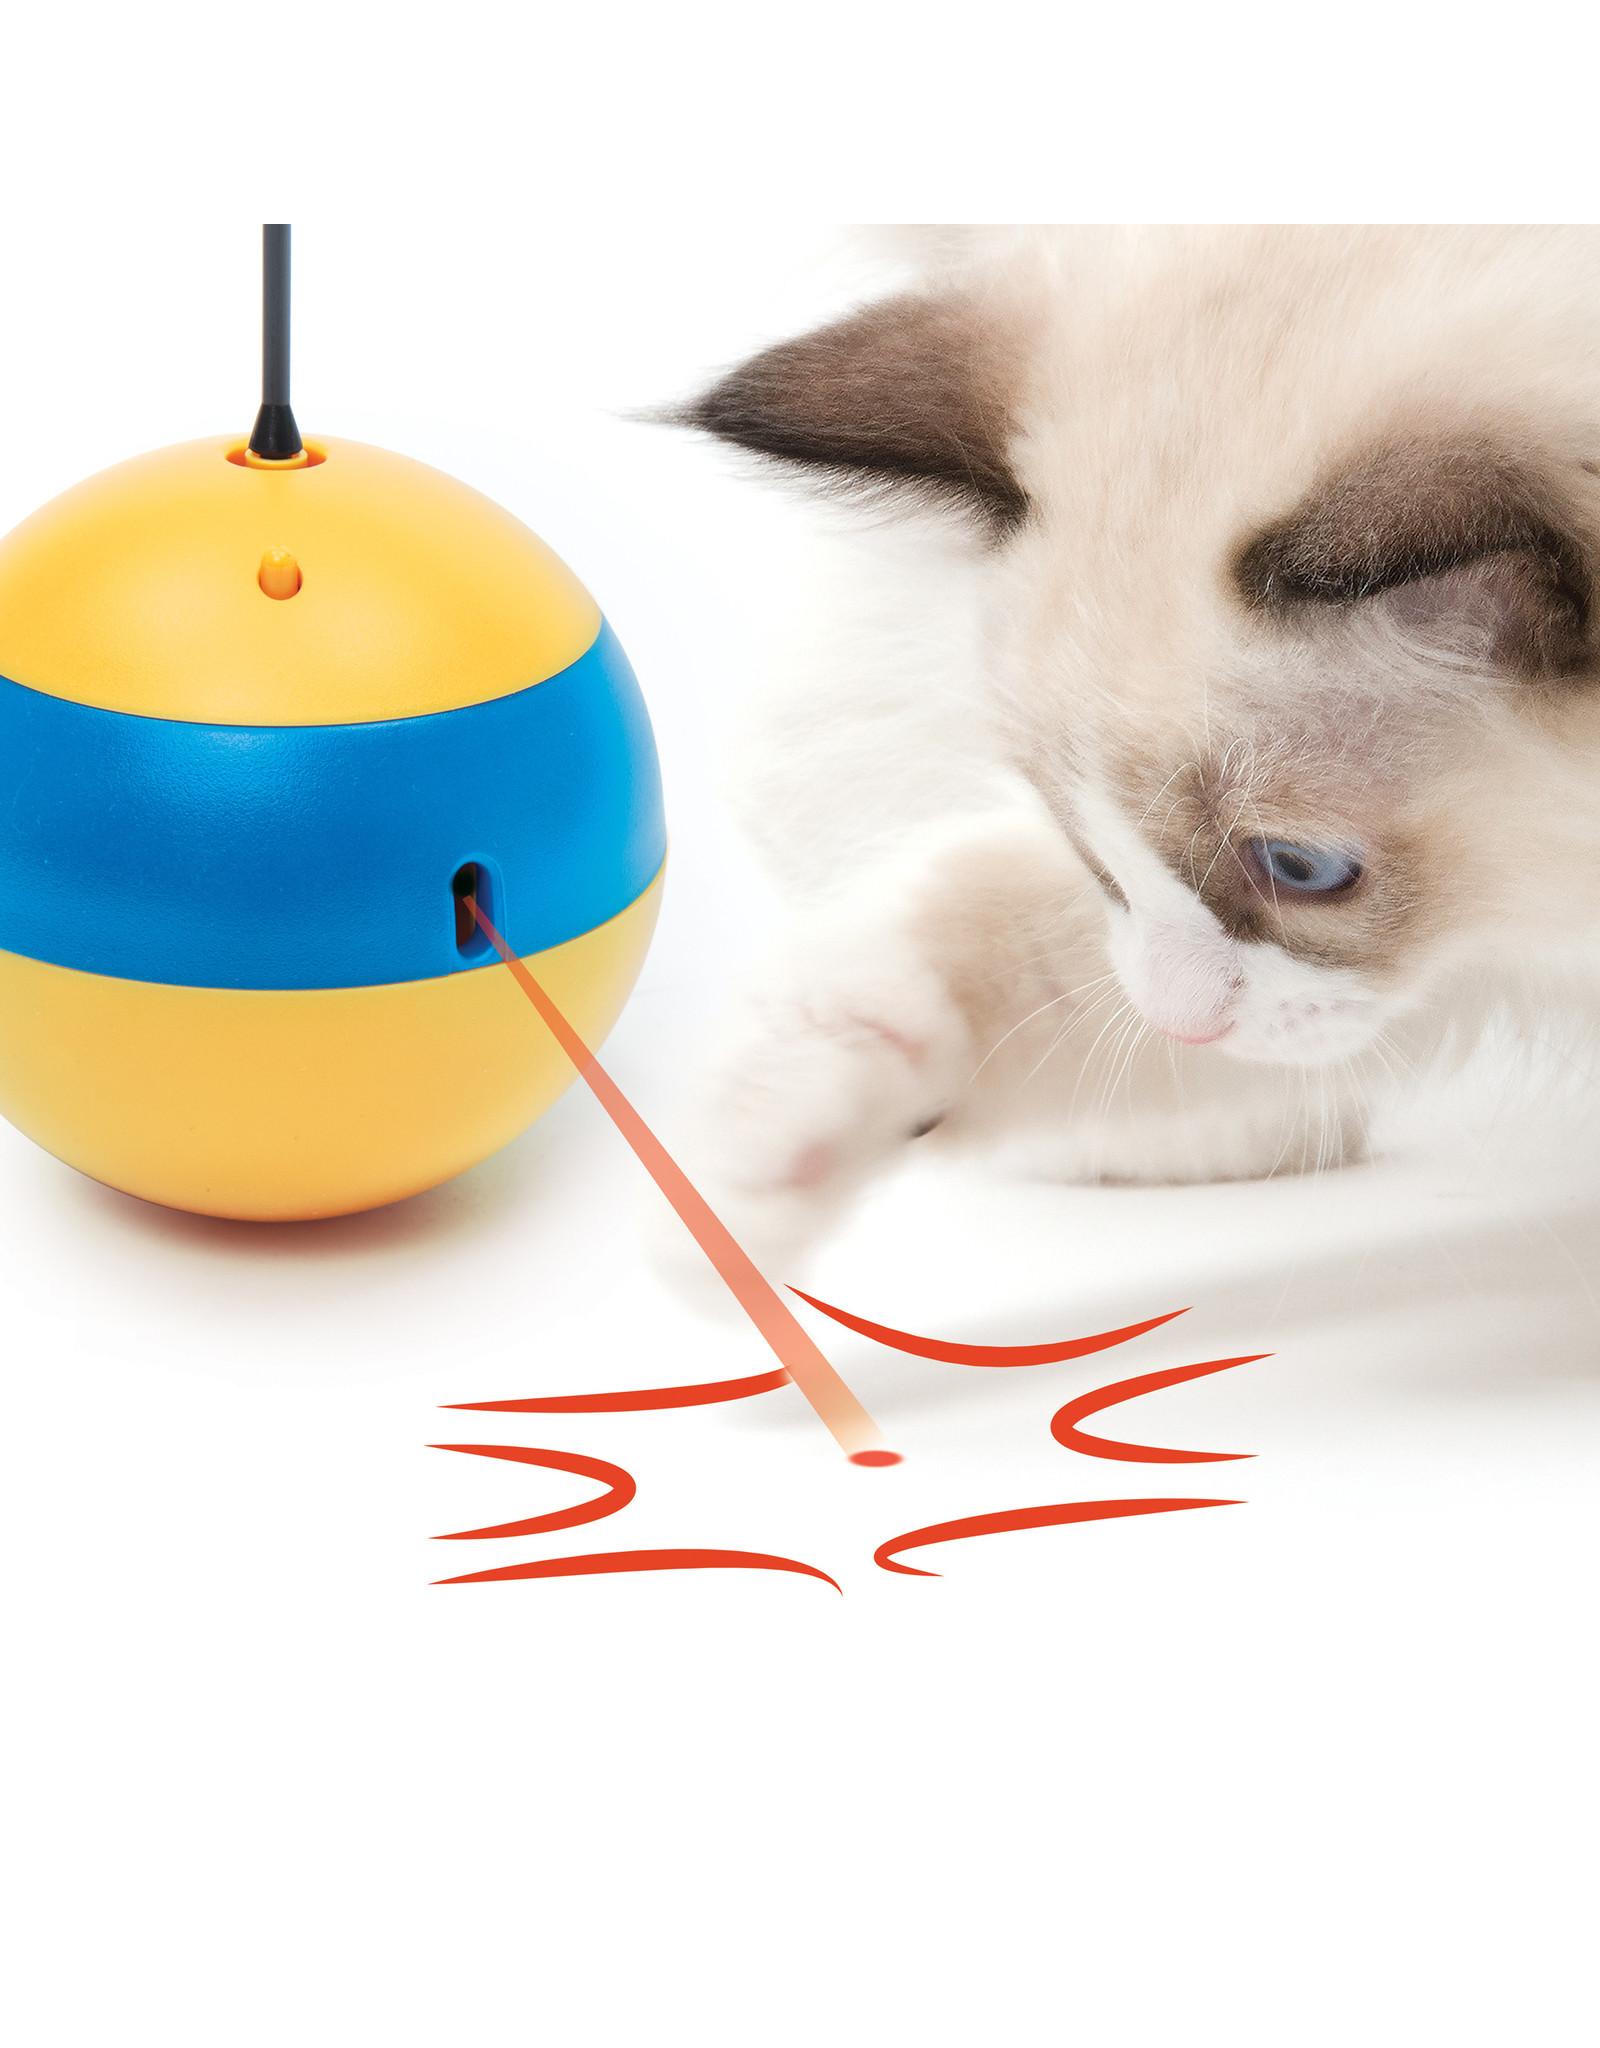 CT - Catit 2.0 Catit 2.0 Play Spinning Bee